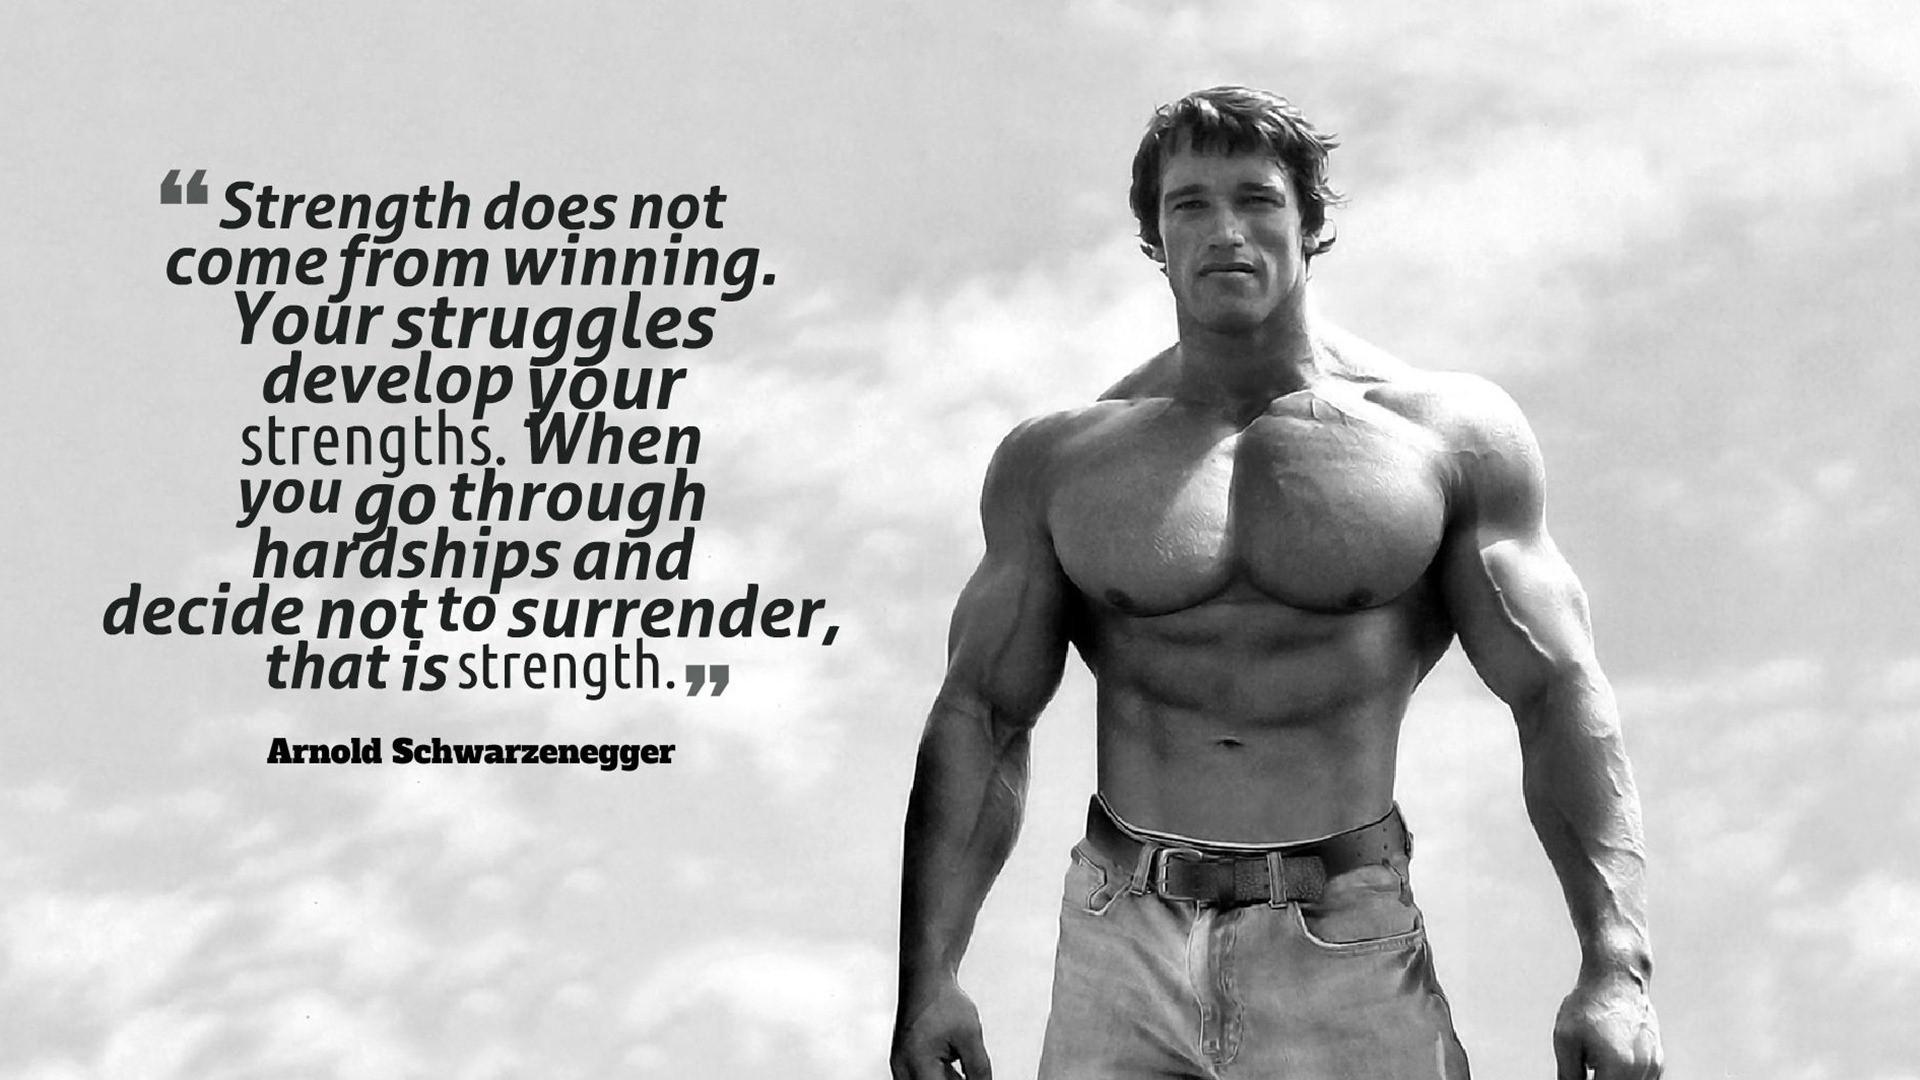 Arnold Schwarzenegger Strength Quotes Wallpaper 00193   Baltana 1920x1080